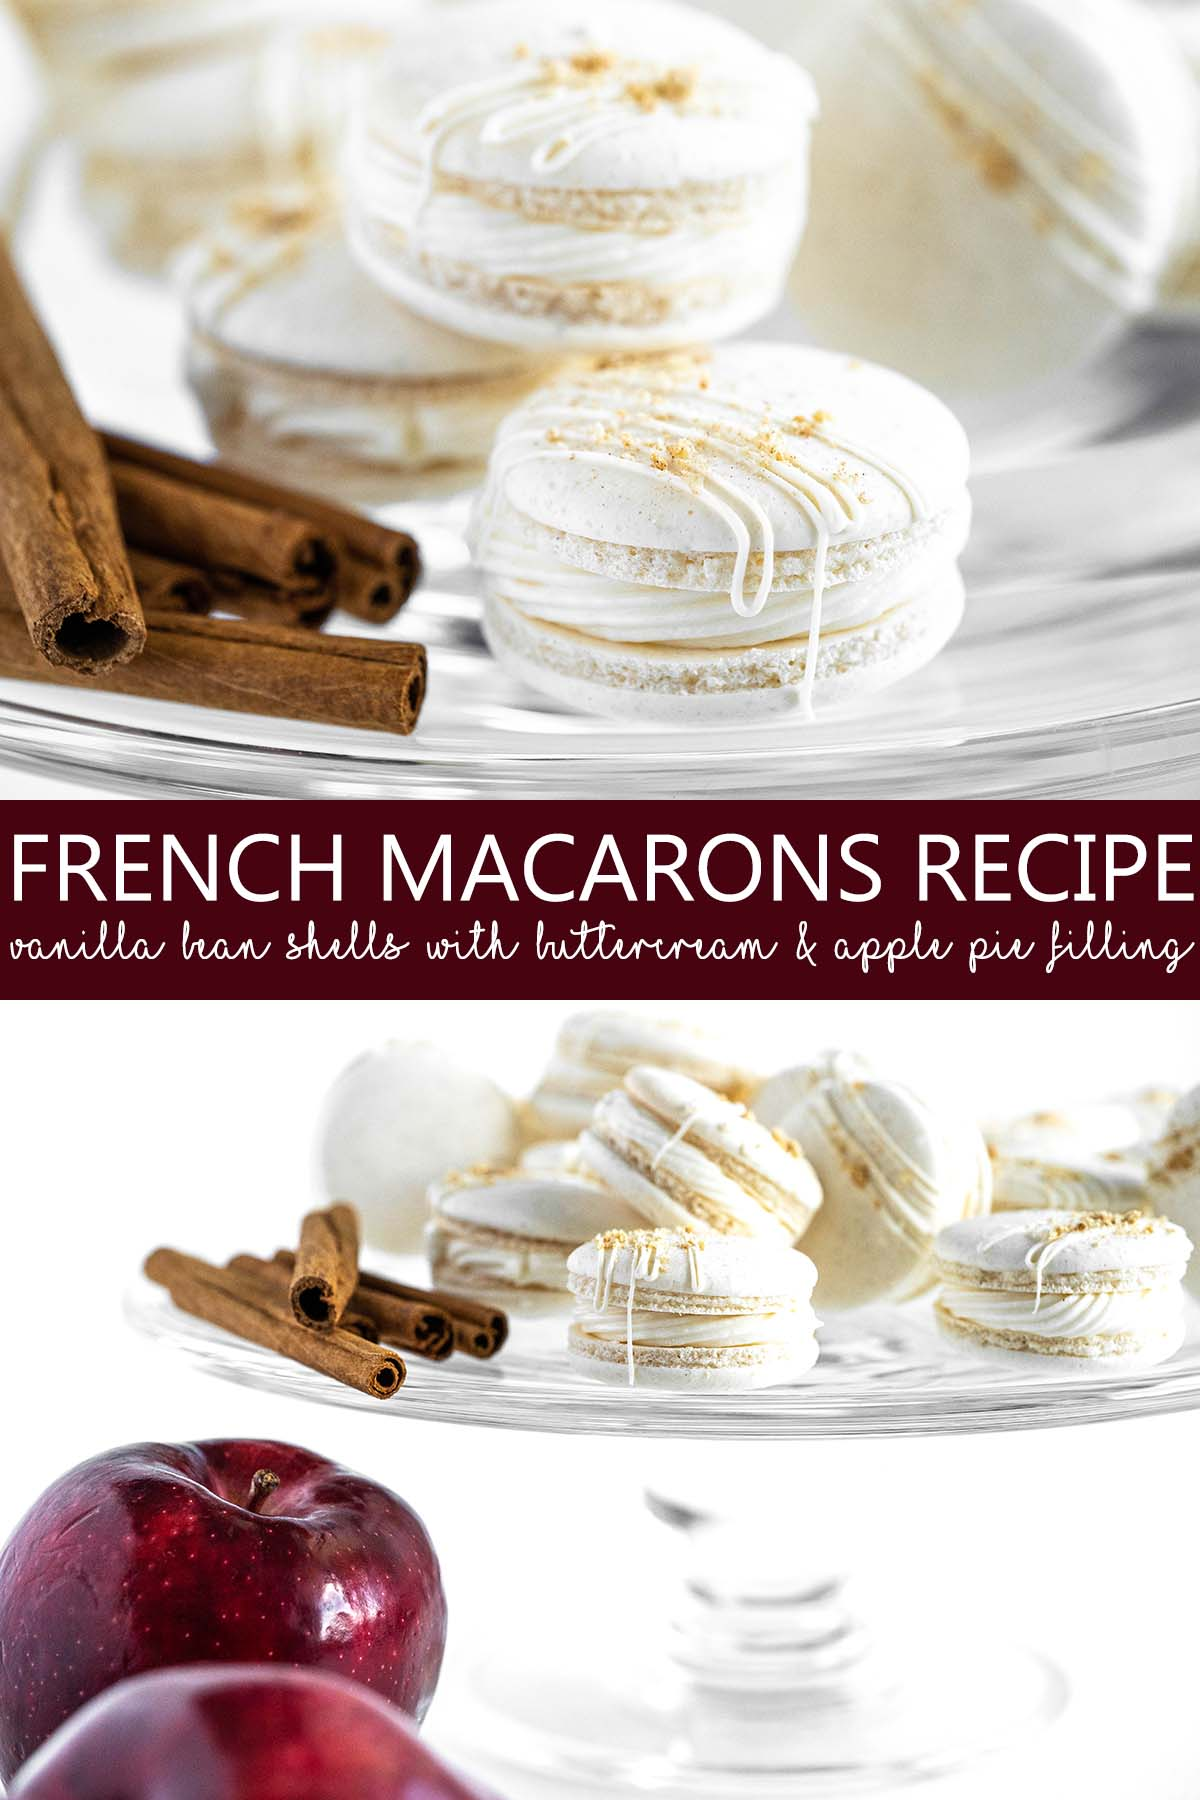 french macarons recipe pin